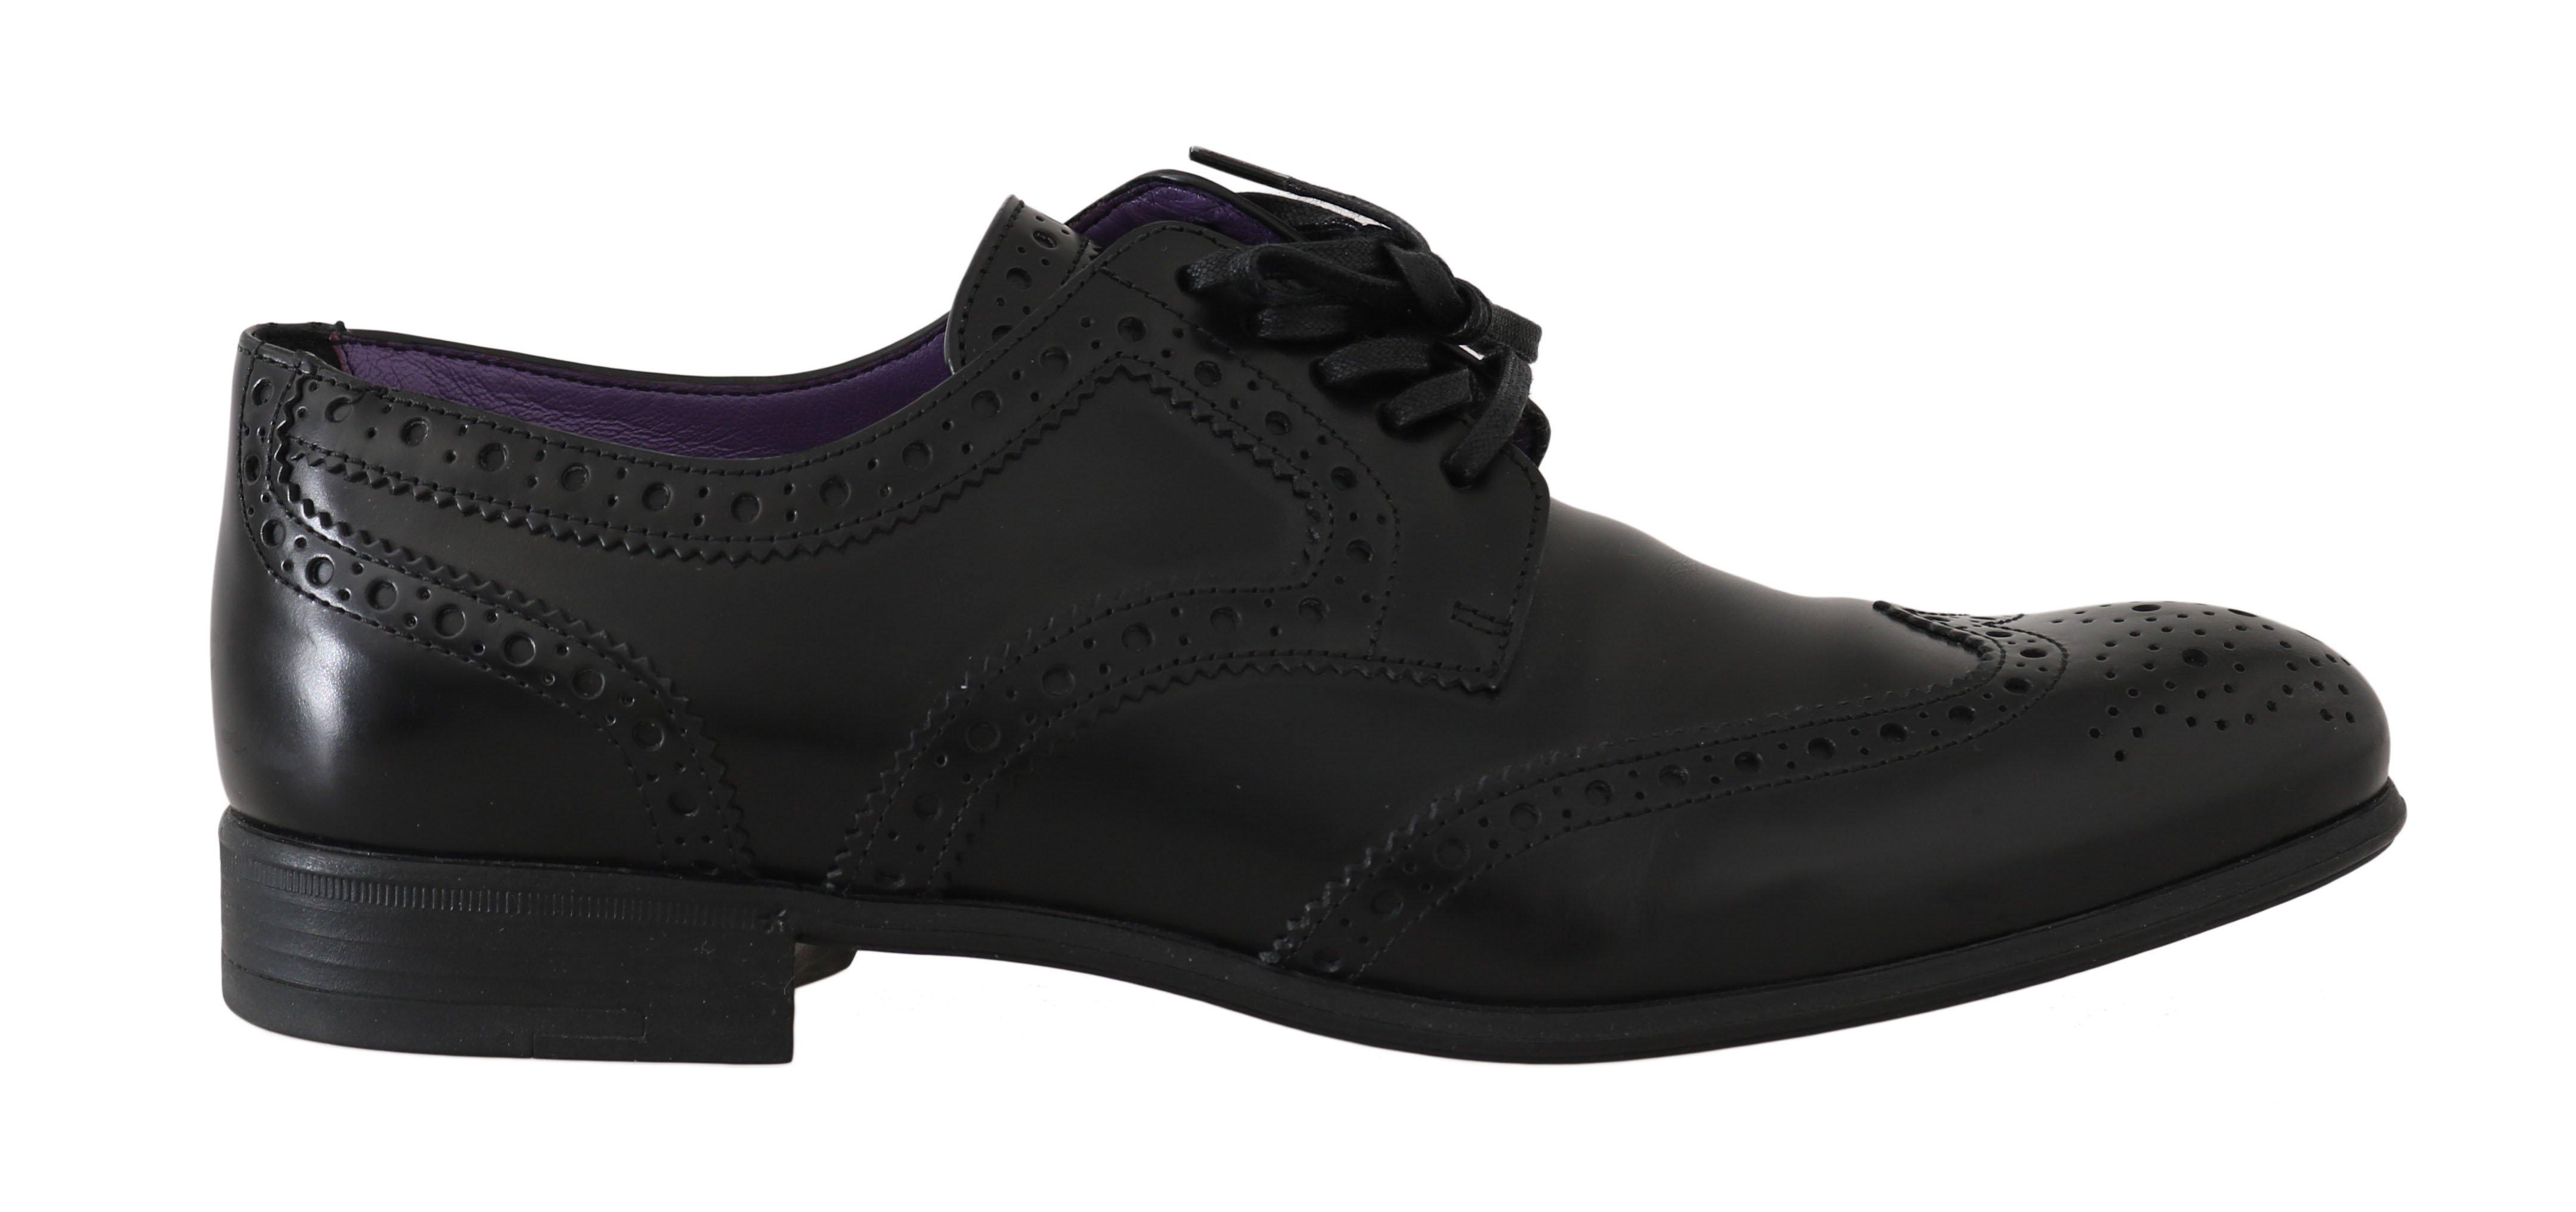 Dolce & Gabbana Women's Leather Perforated Flat Shoe Brown LA5526 - EU38.5/US8